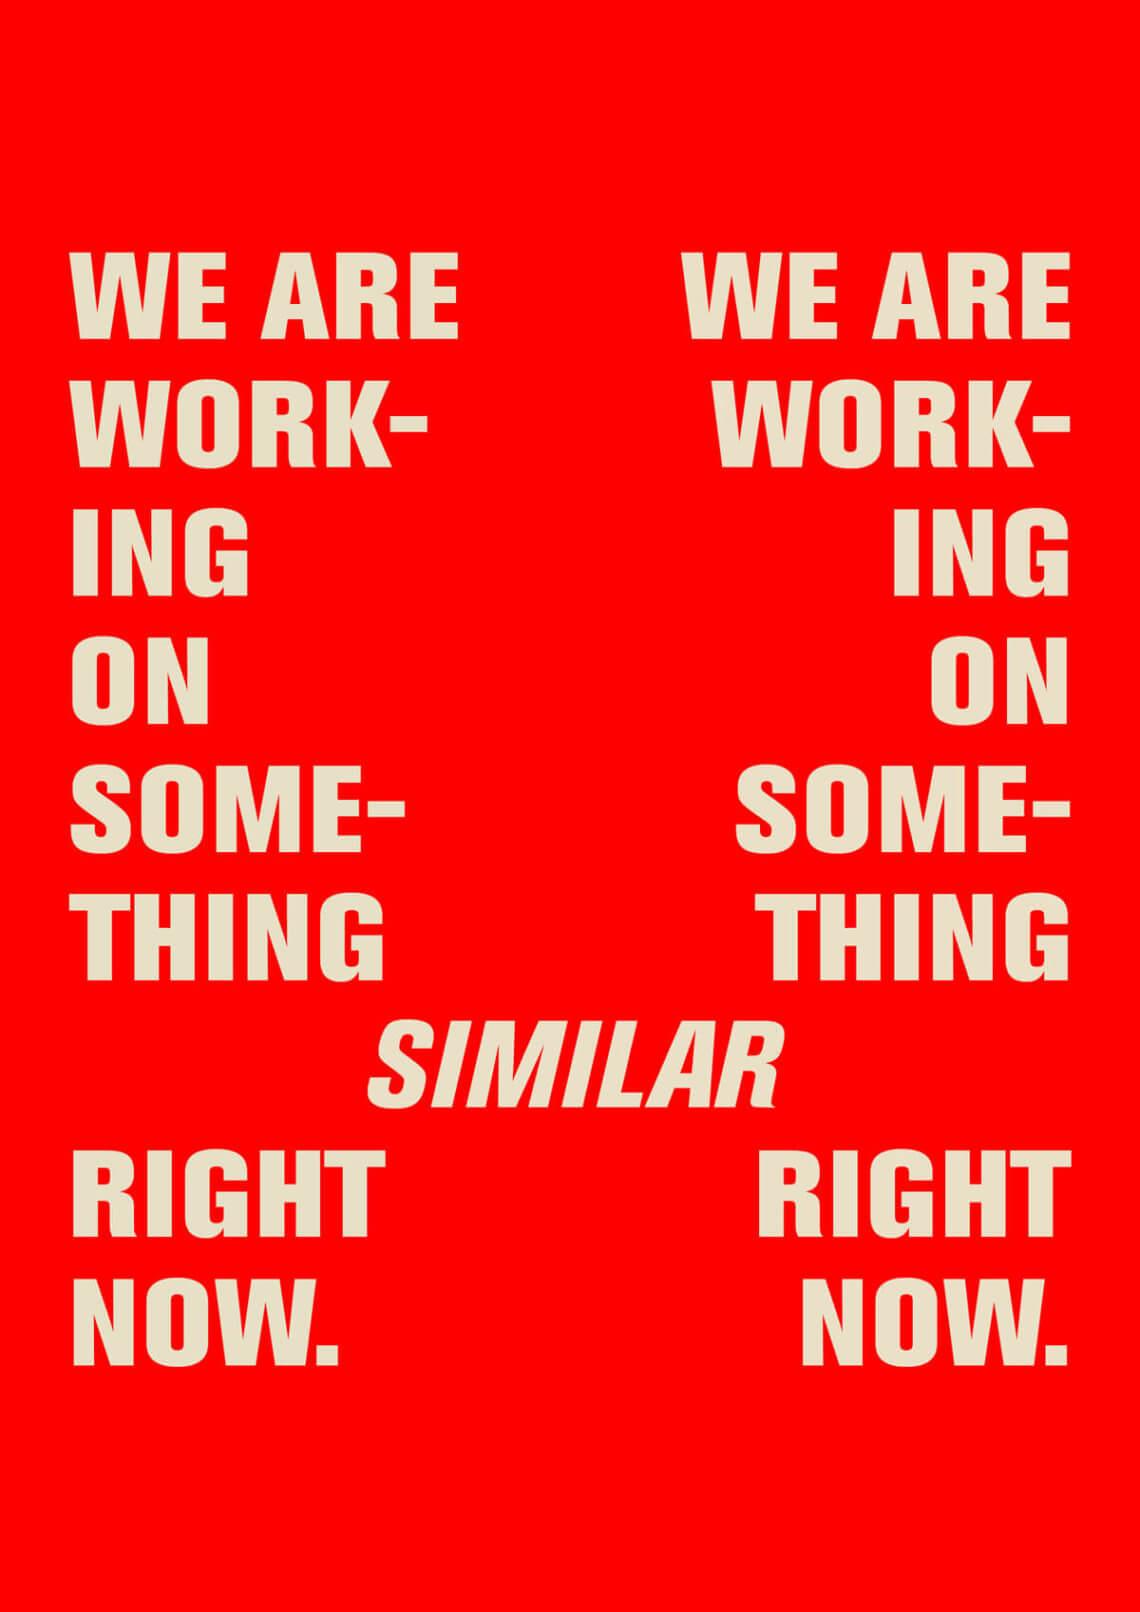 Daniel-Angermann-similar-poster Similar Poster